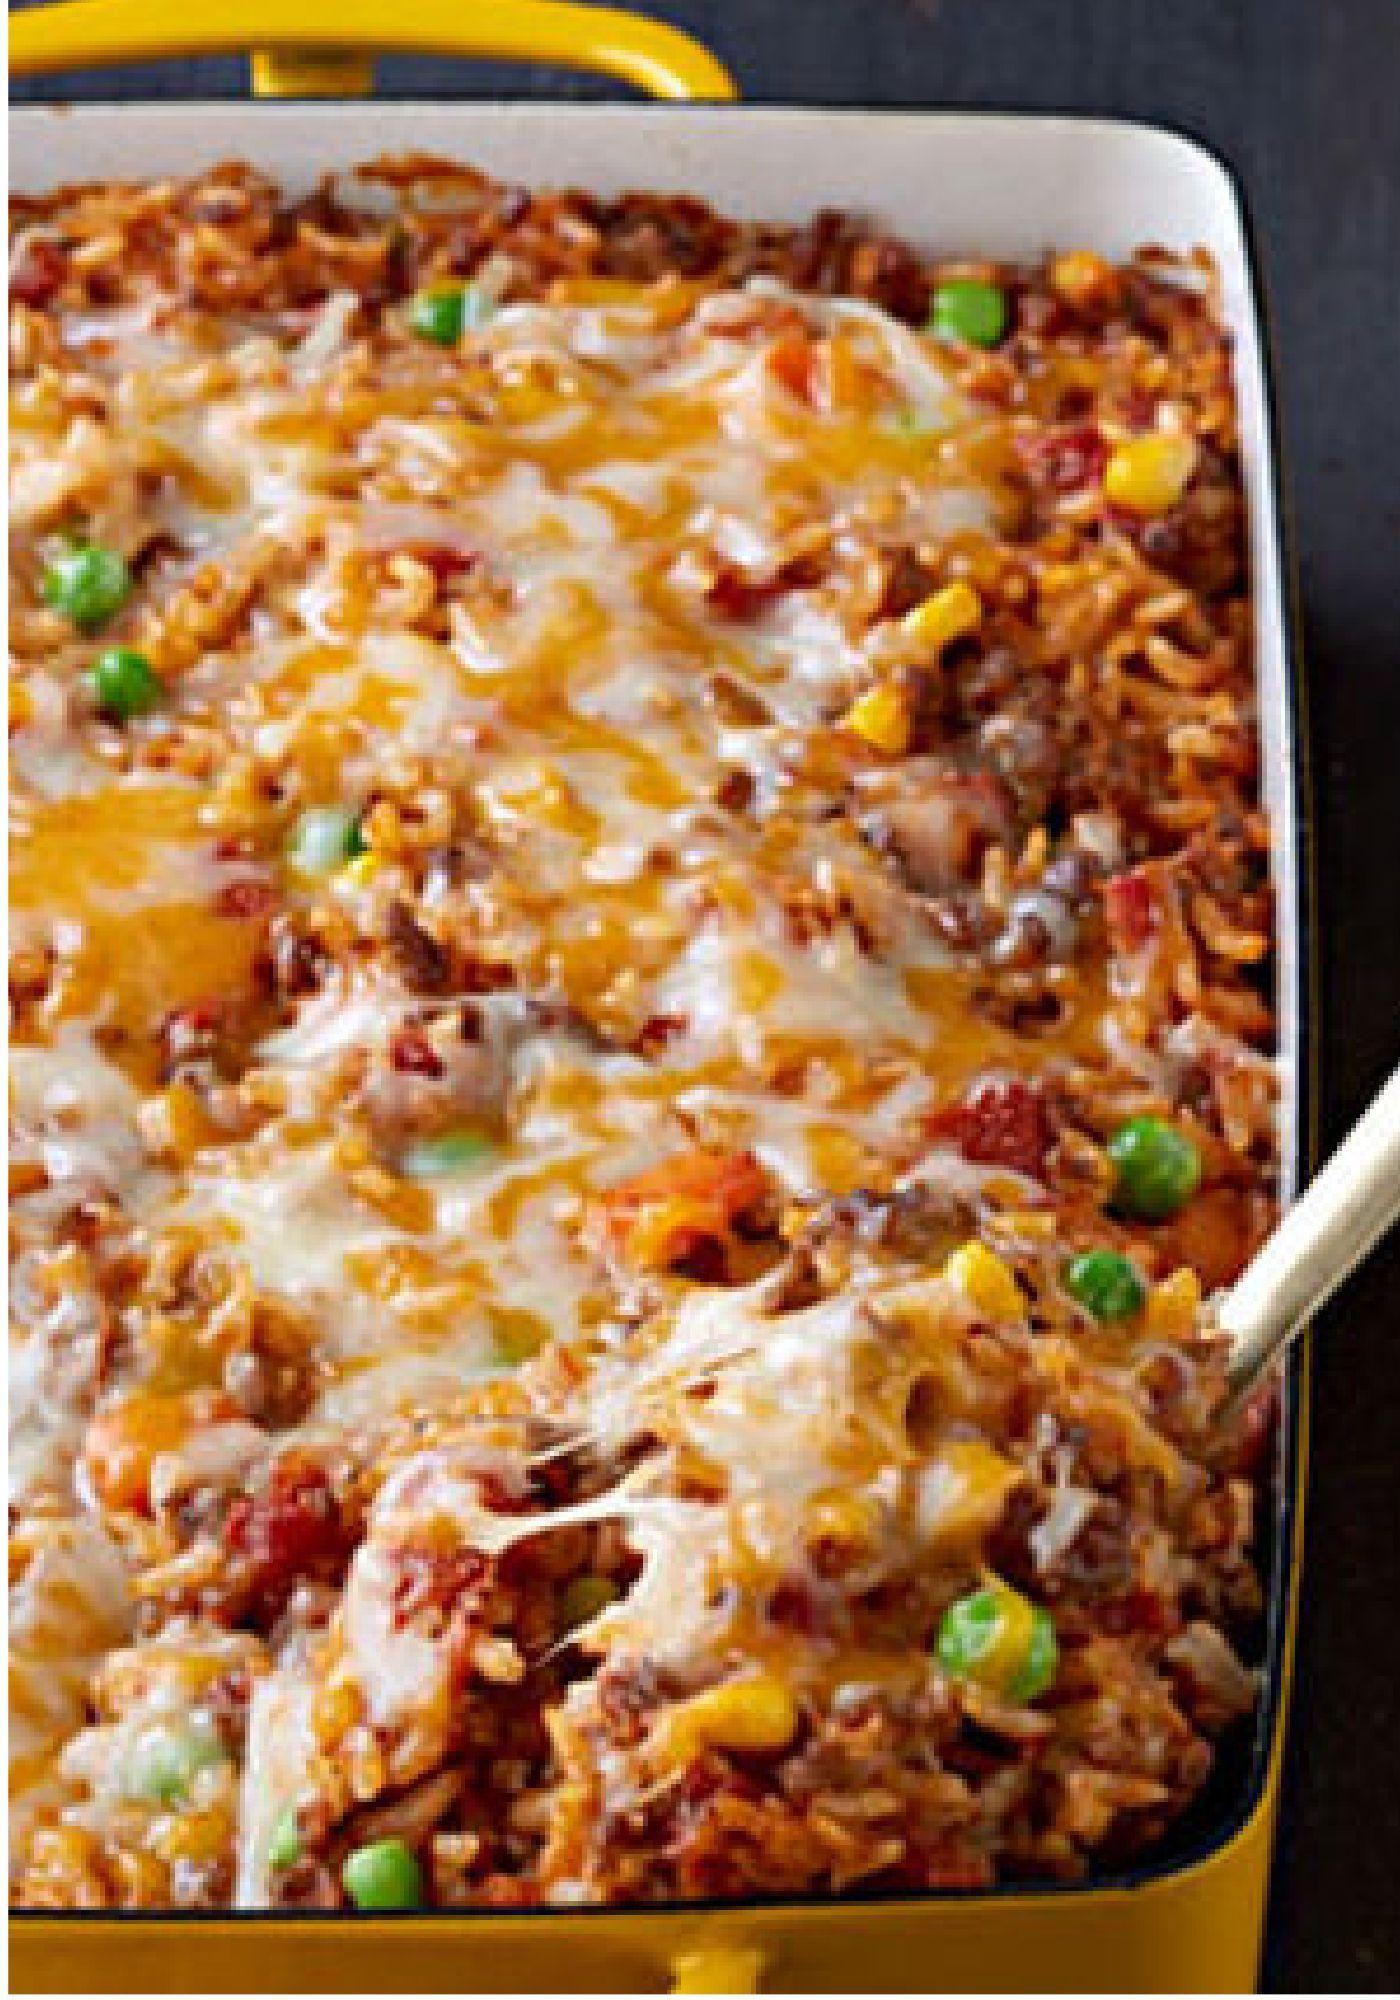 Best 25 Casseroles With Ground Beef Ideas On Pinterest Foodeasy Foodrecipesideas Recipesfoodea In 2020 Mexican Food Recipes Flavorful Beef Ground Beef Recipes